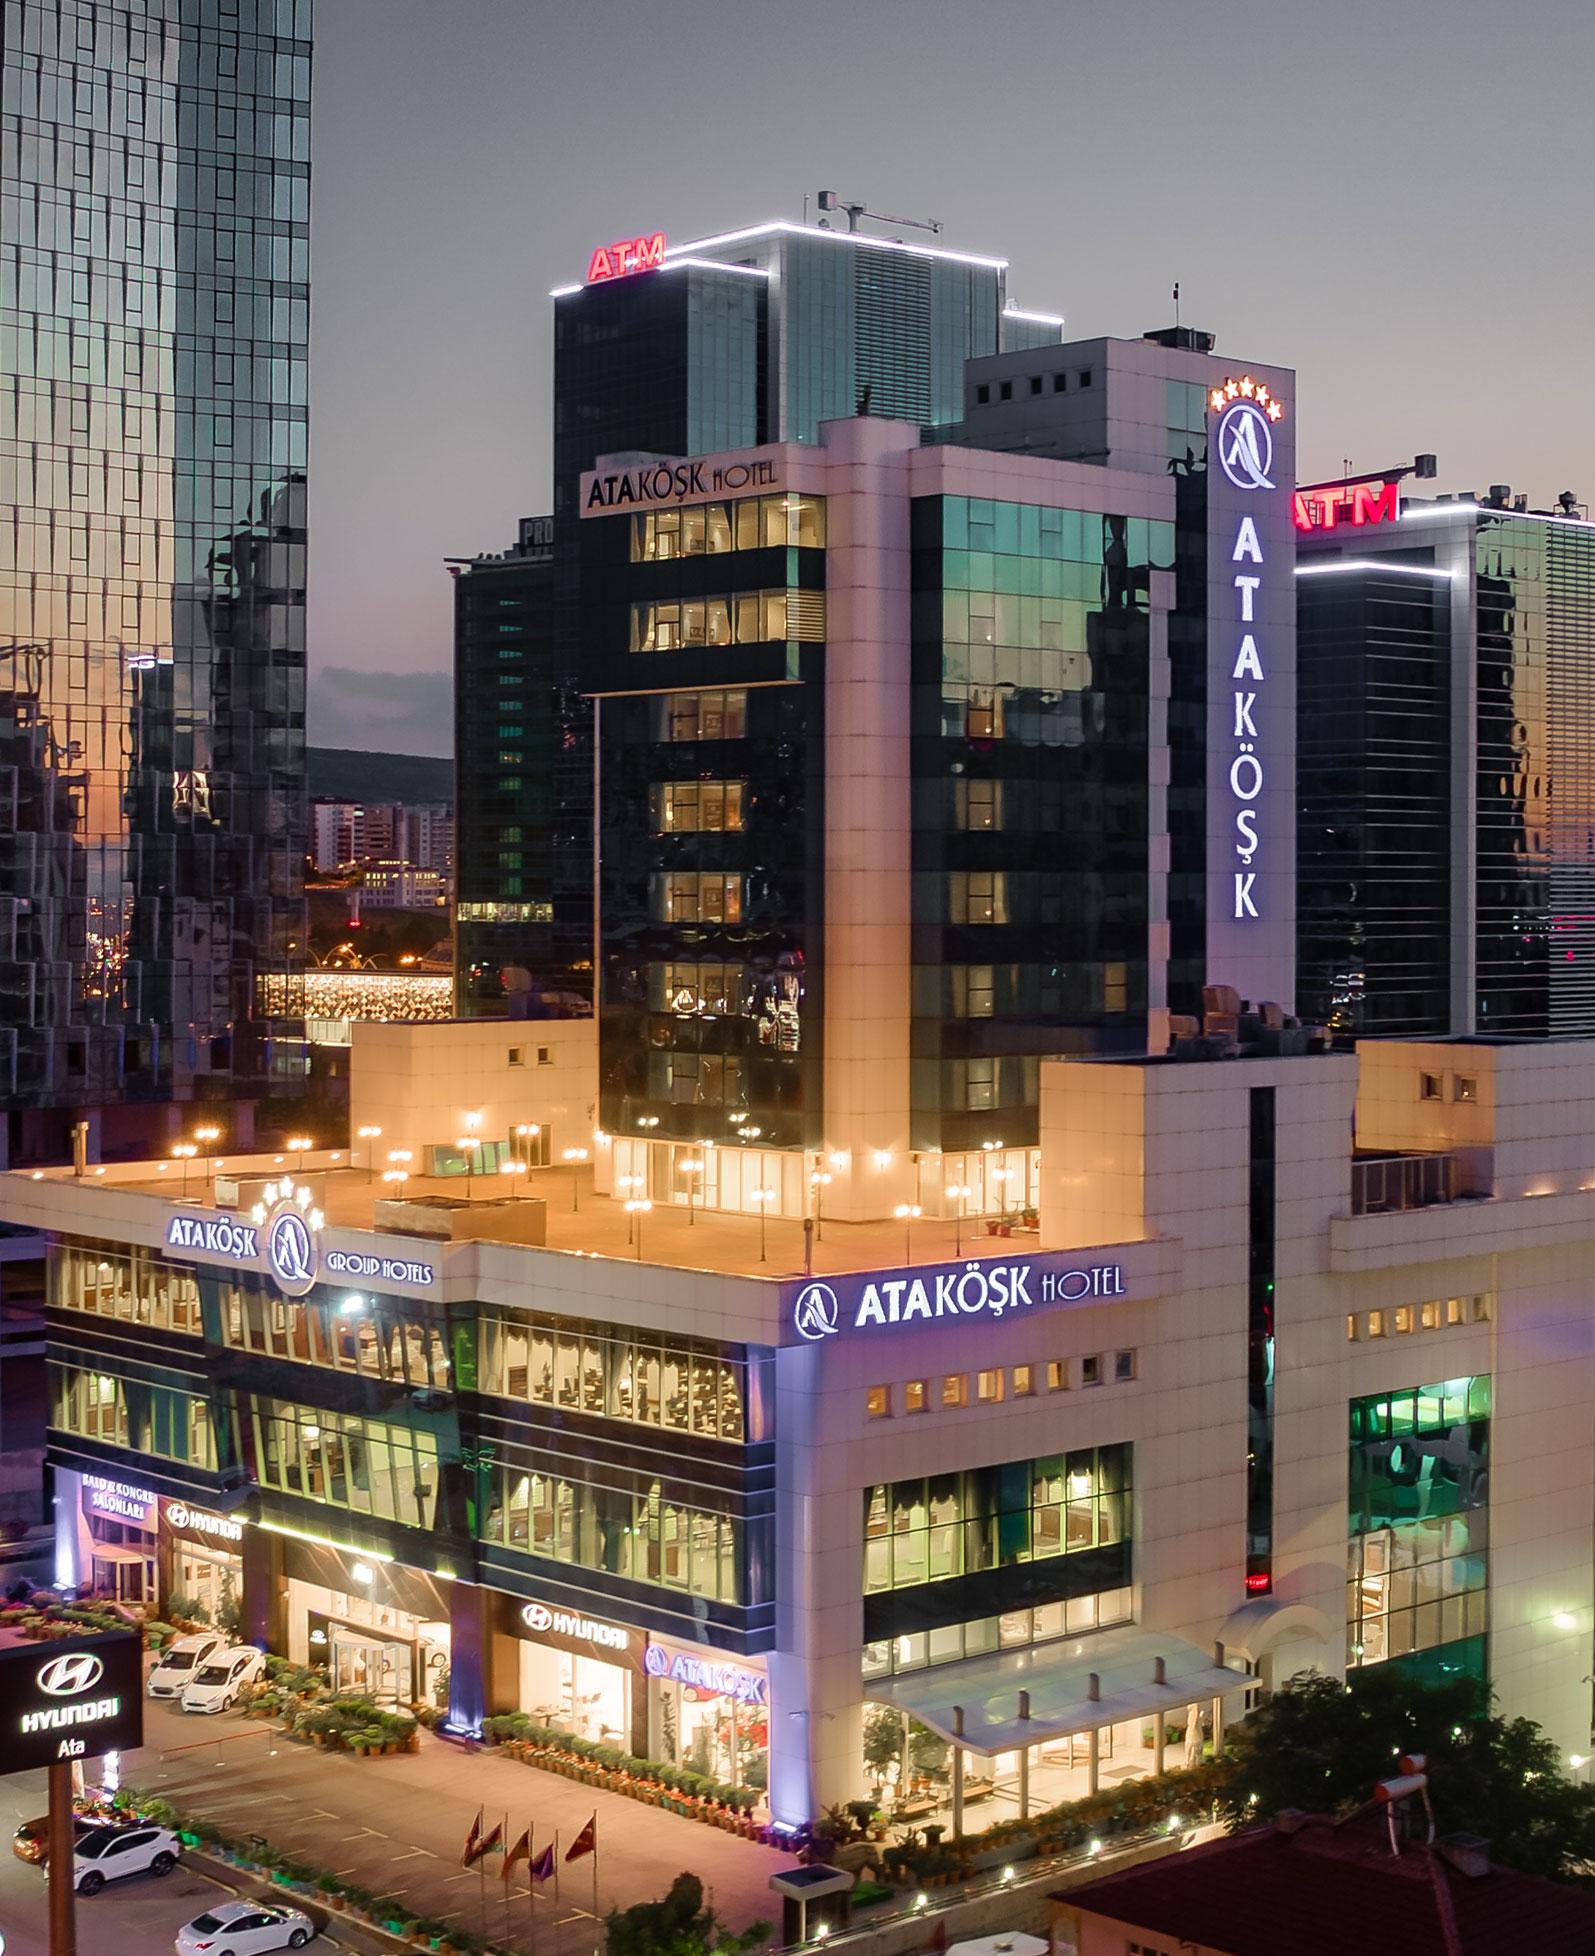 7. Ataköşk Hotel